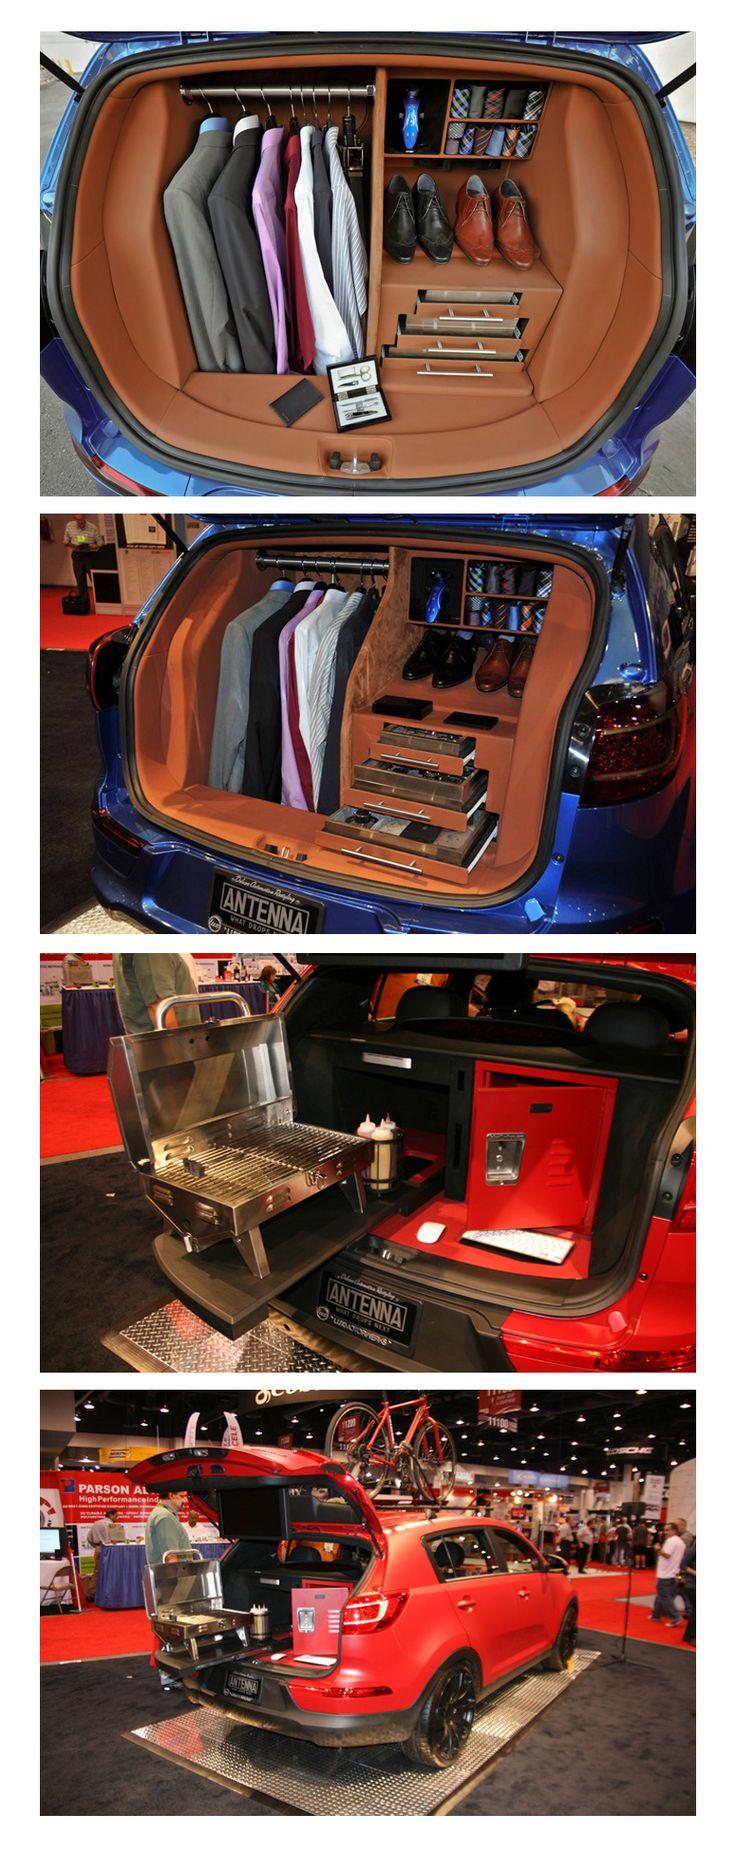 Two Superb Custom Kia Sportage's  http://blog.nobodydealslike.com/index.php/2015/07/22/two-superb-custom-kias/  #KIASportage #BankStreetKIA #KIAOnHuntClub #Dilawri